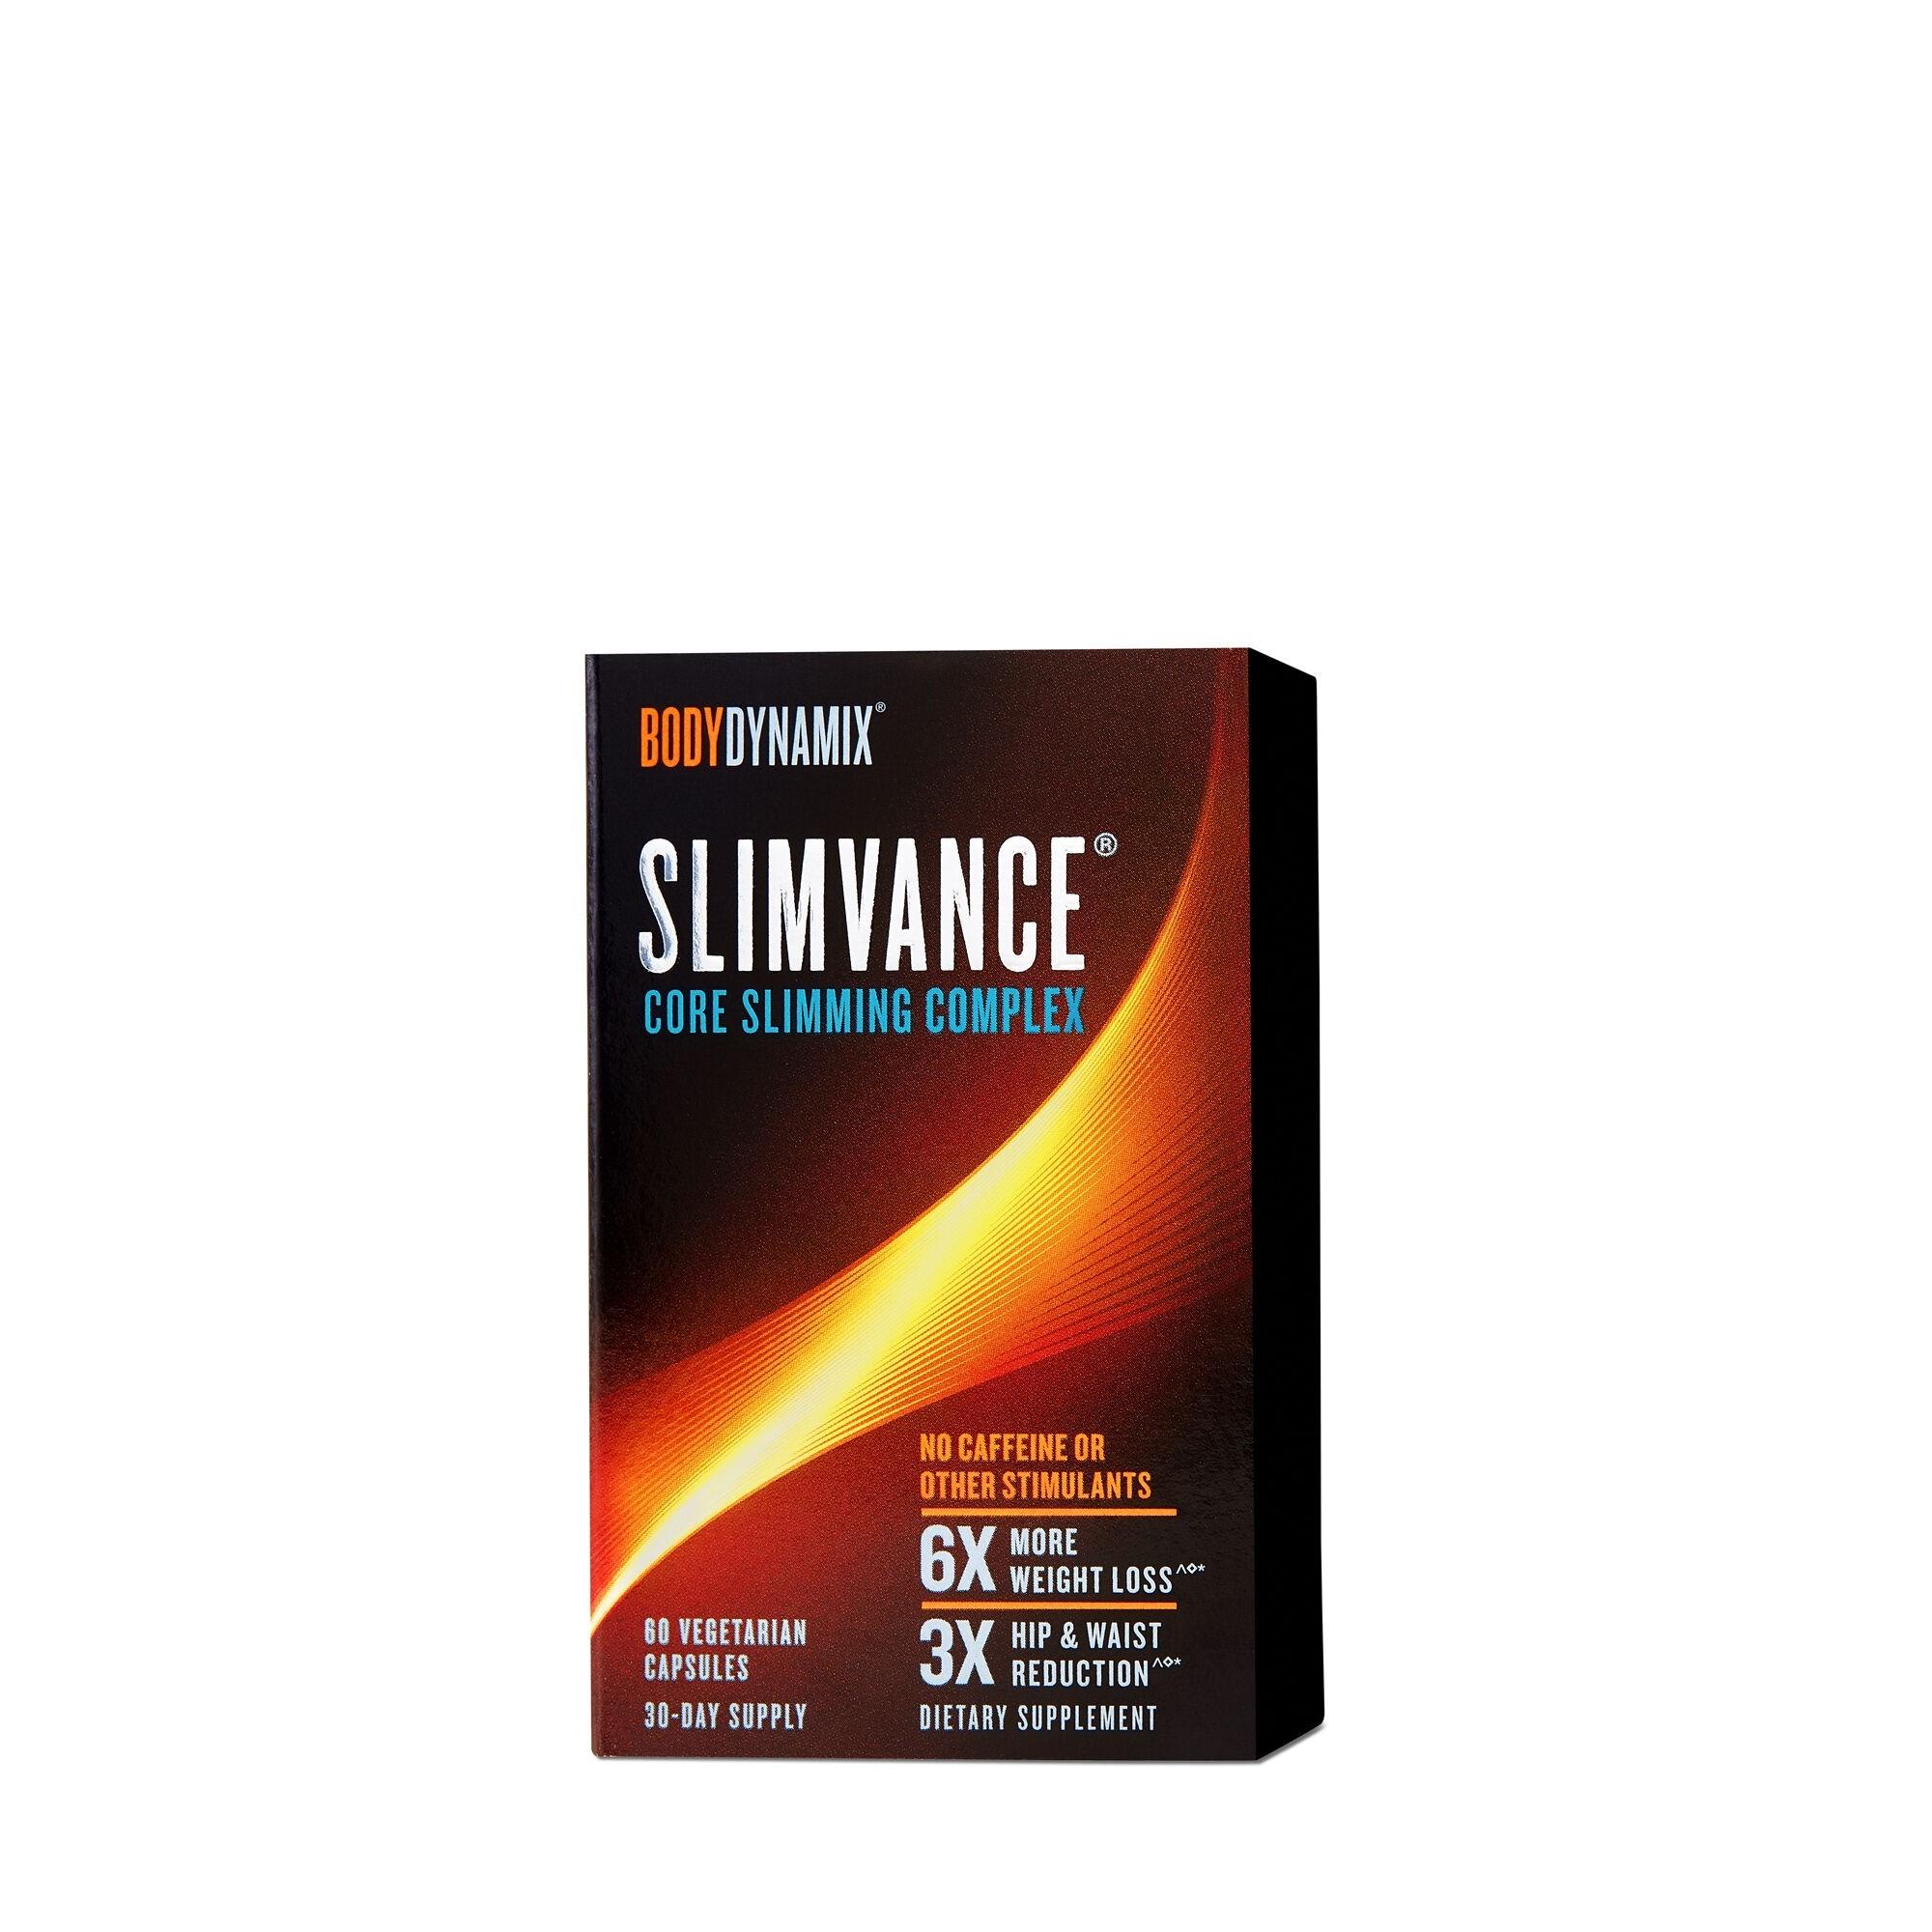 BodyDynamix™ Slimvance® Core Slimming Complex Stimulant Free, Formula Pentru Controlul Greutatii, 60 cps